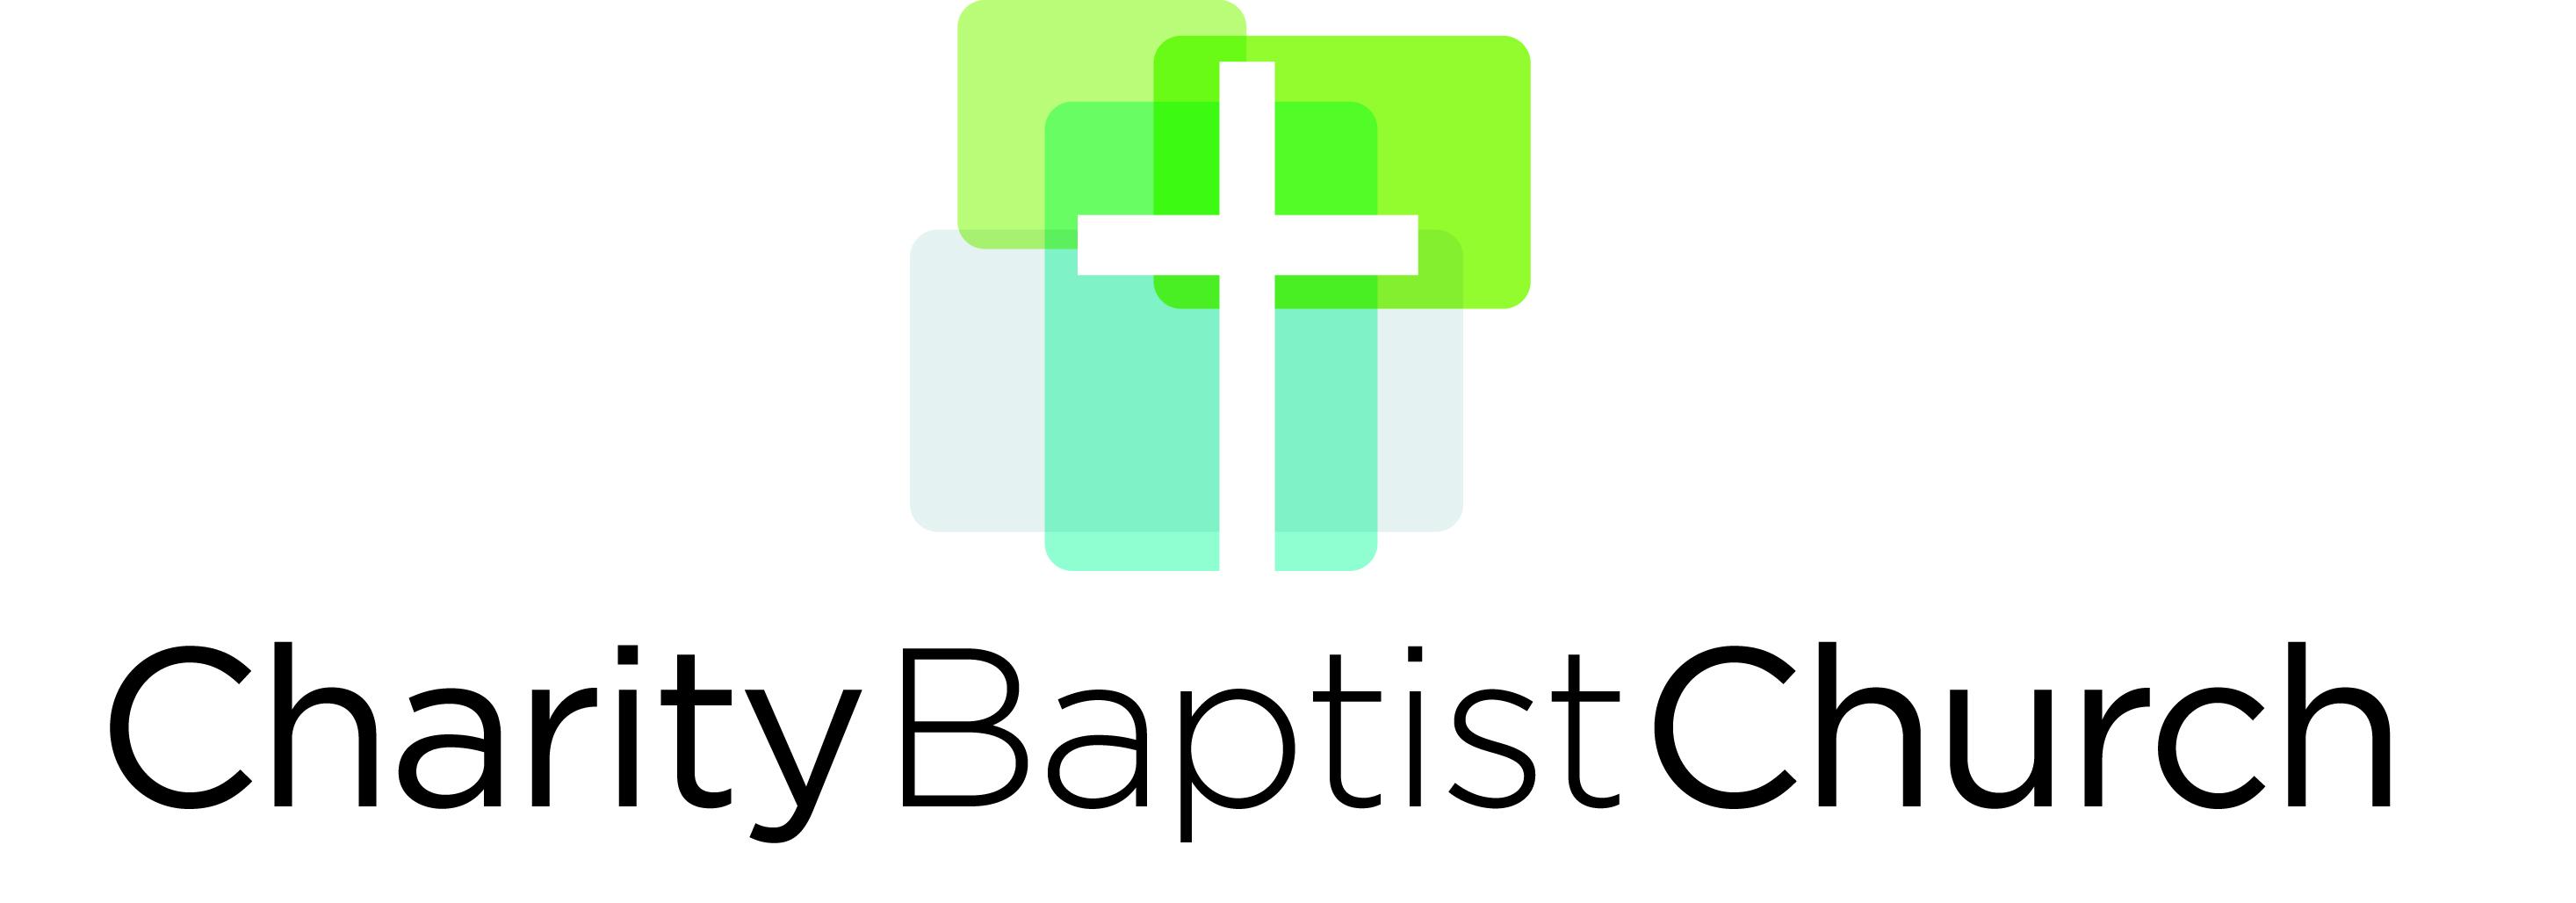 Charity Baptist Church of Kannapolis, NC